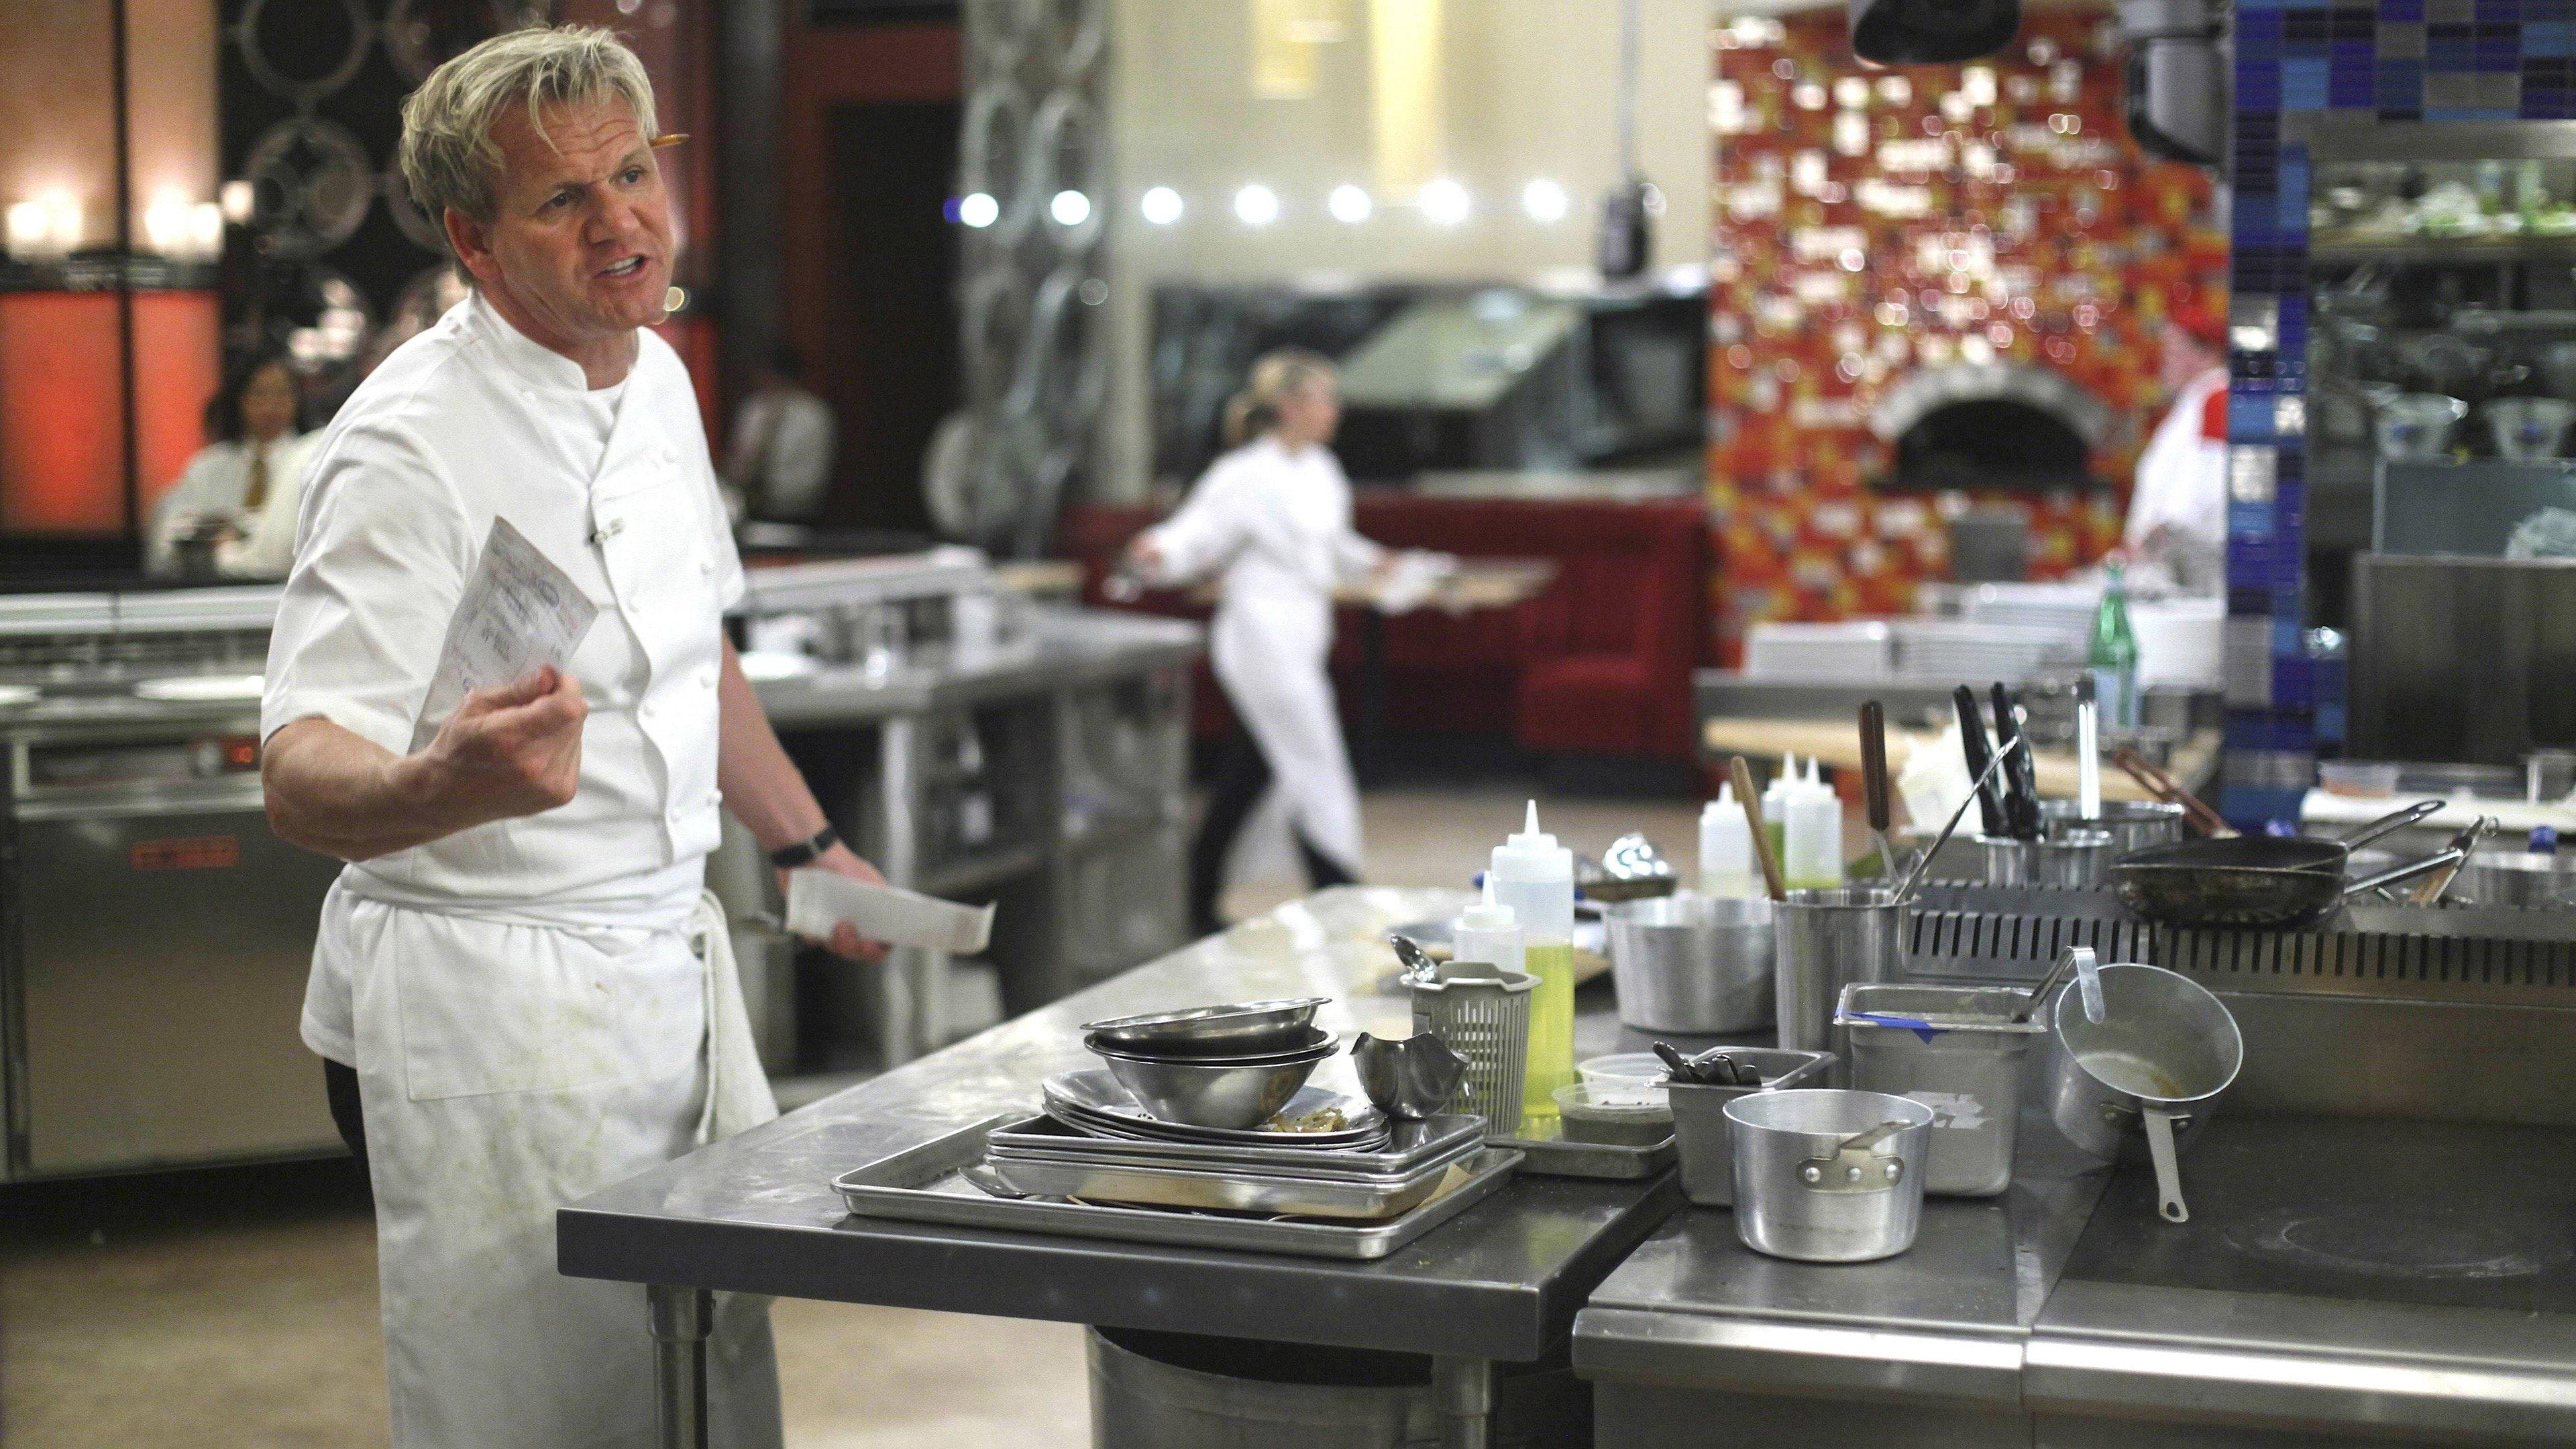 11 Chefs Compete, Part 2